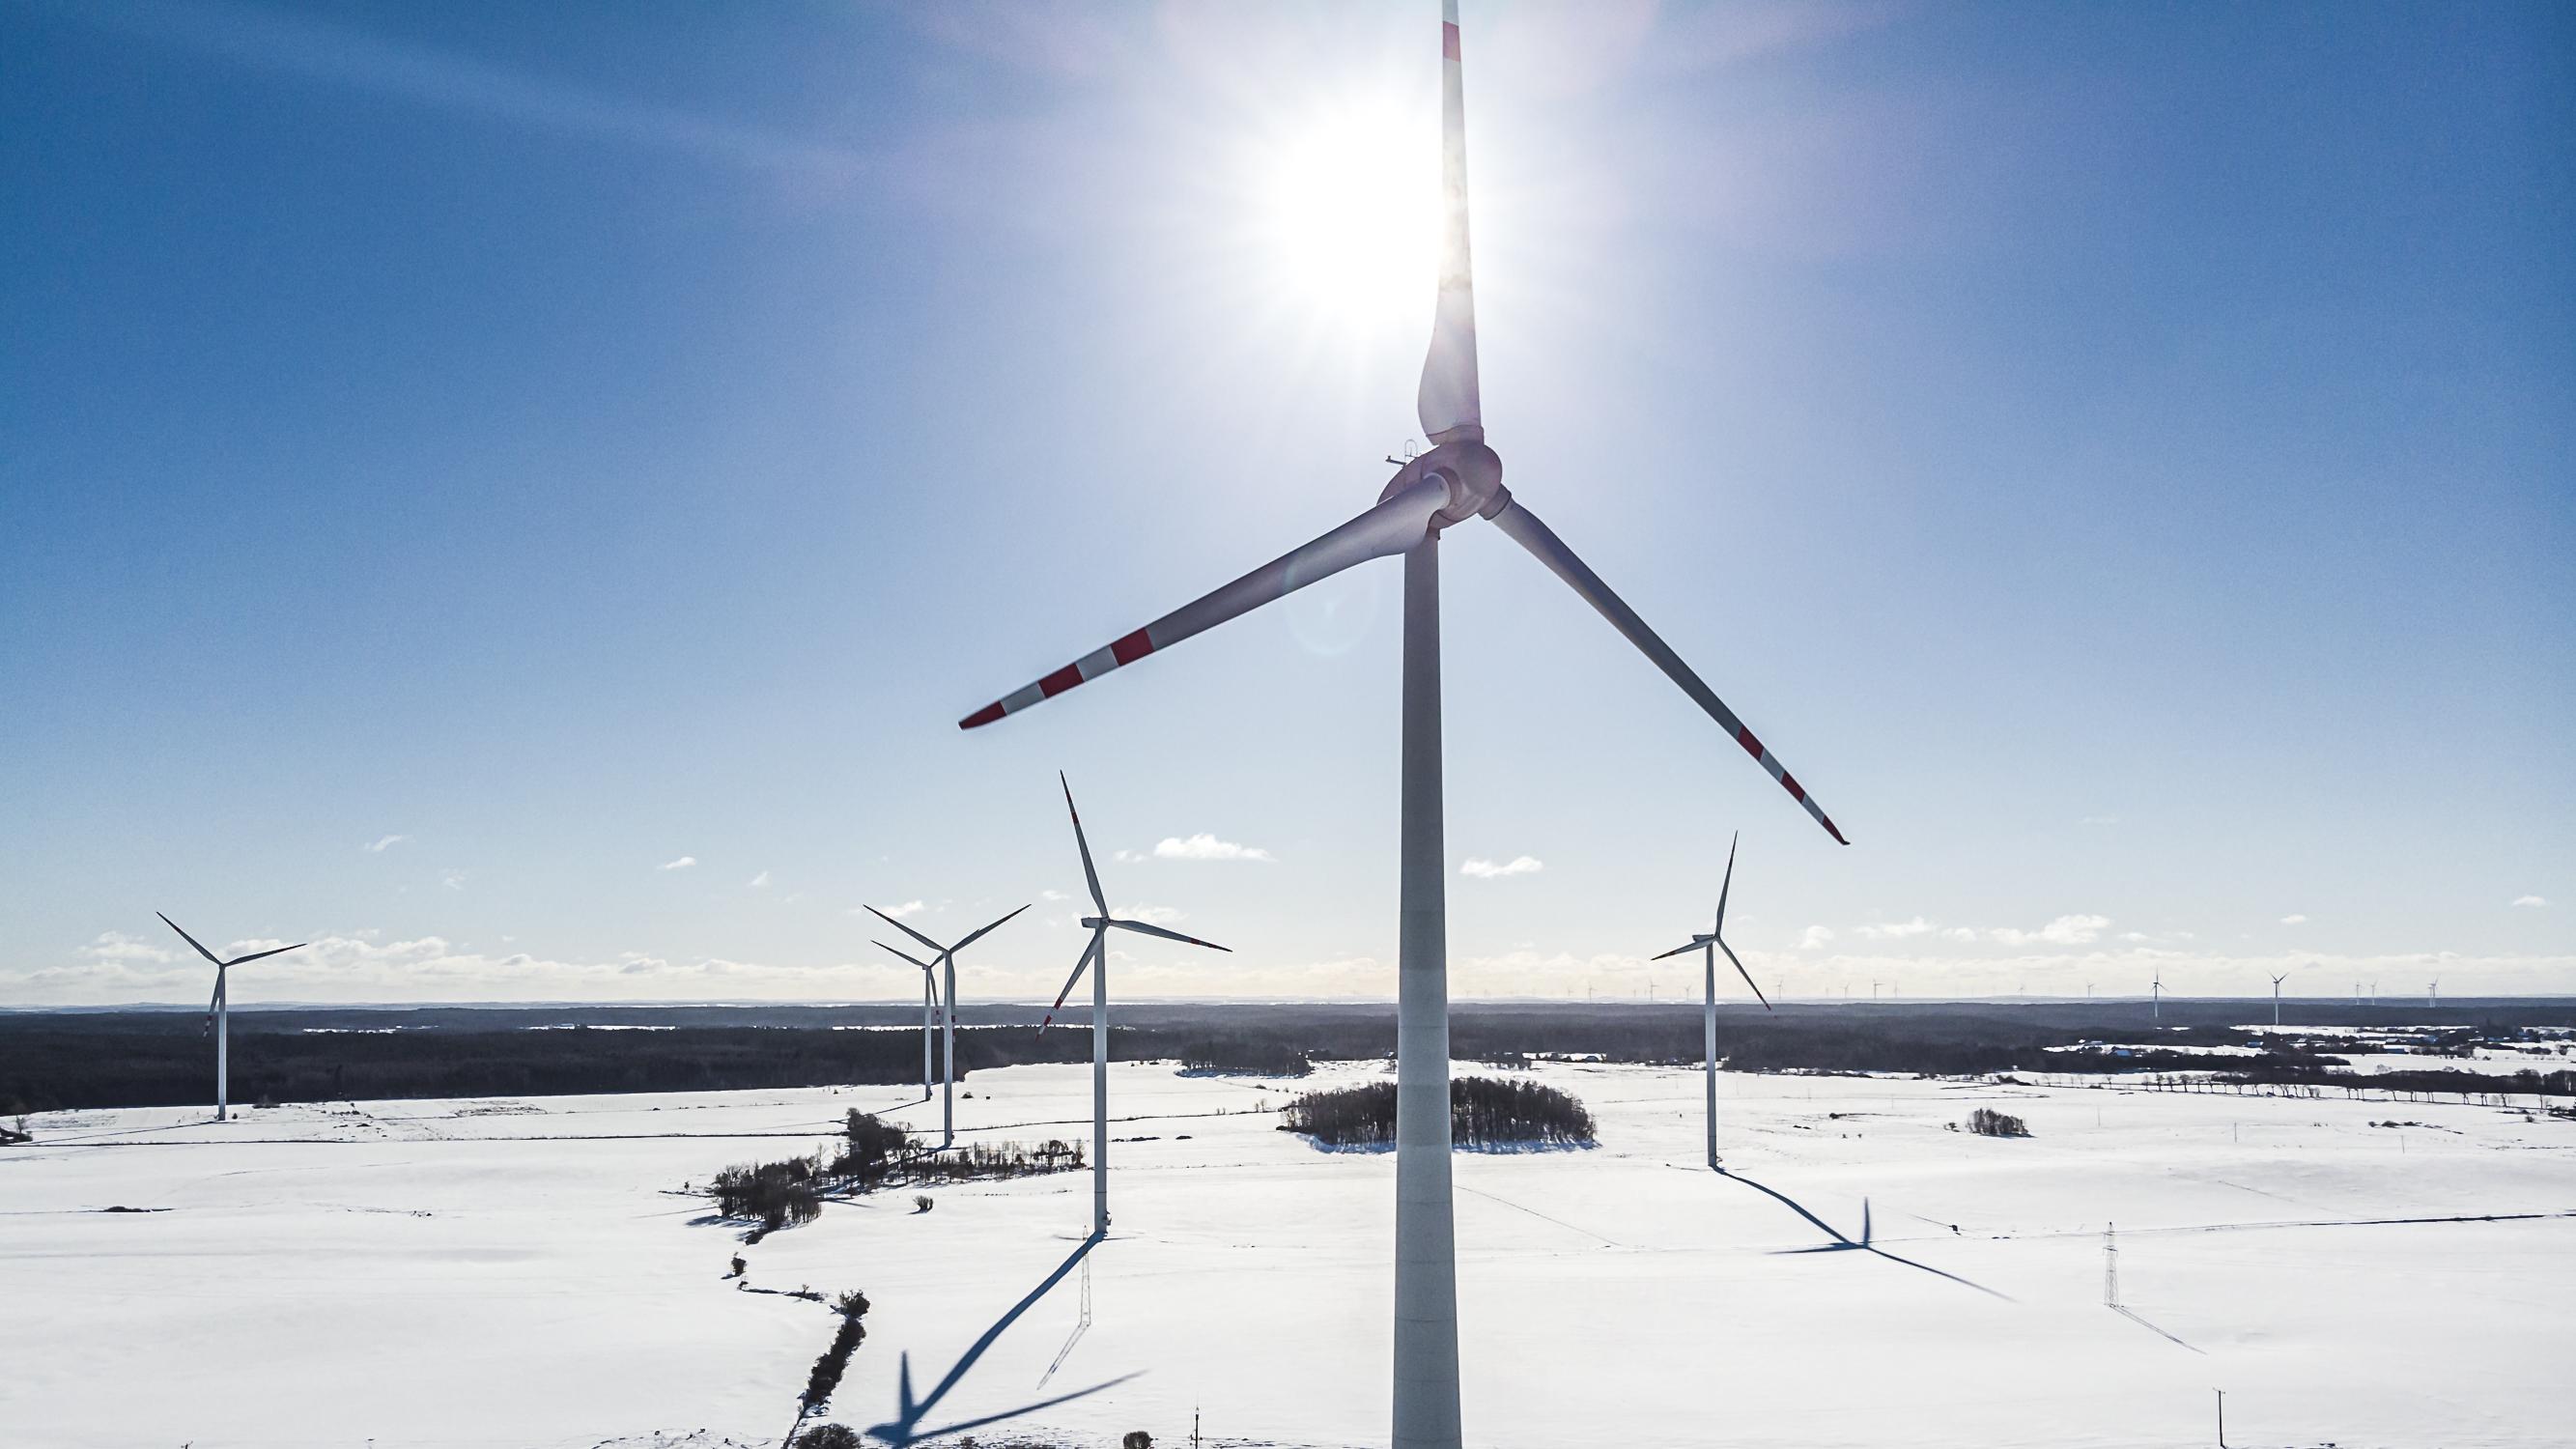 Nowe moce odnawialne w Grupie ORLEN